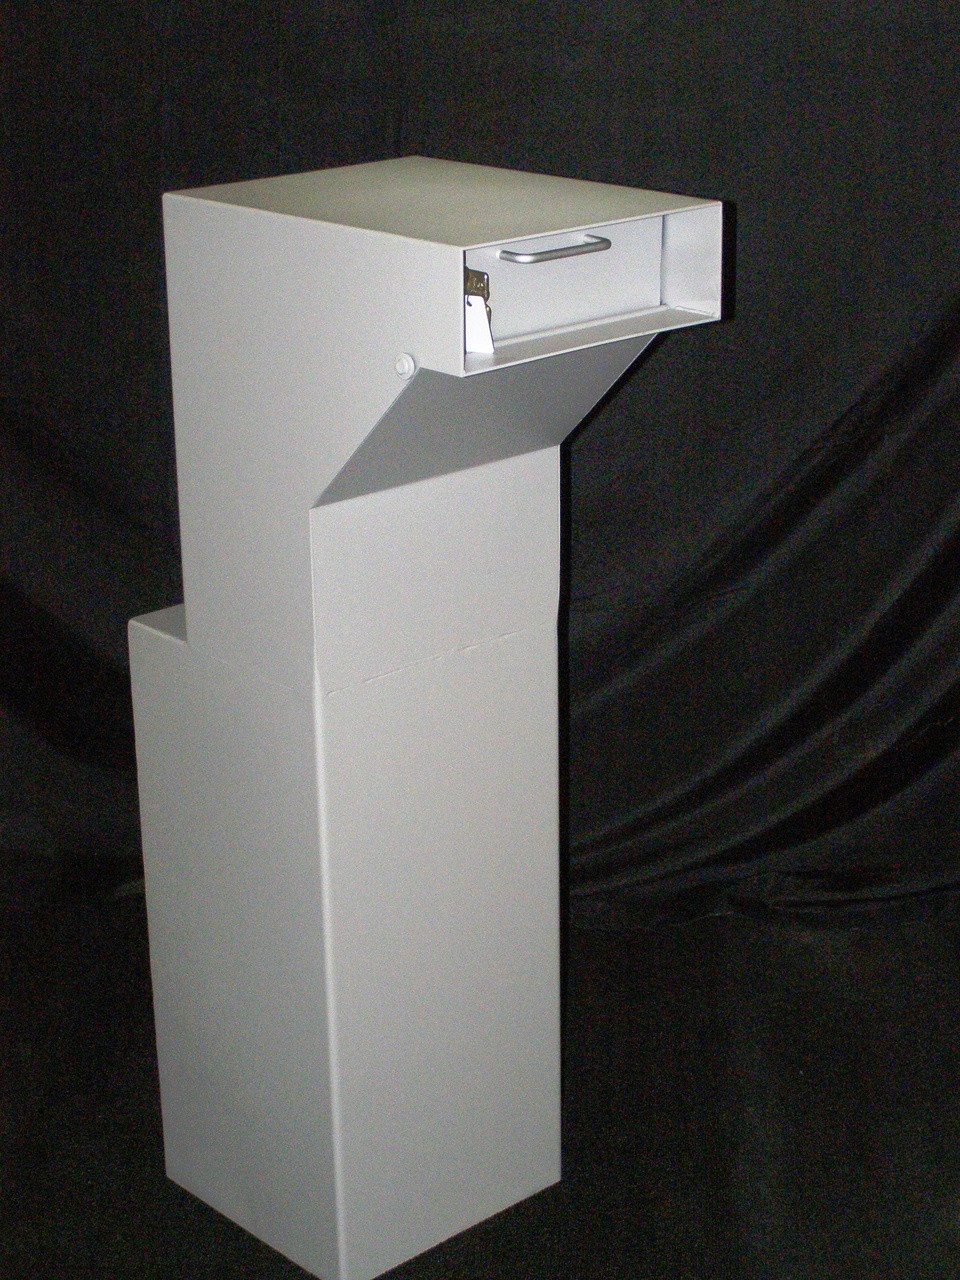 Floor Mounted High Security Through the Wall Custom Deposit Drop Box with Hopper Drop Door black back ground